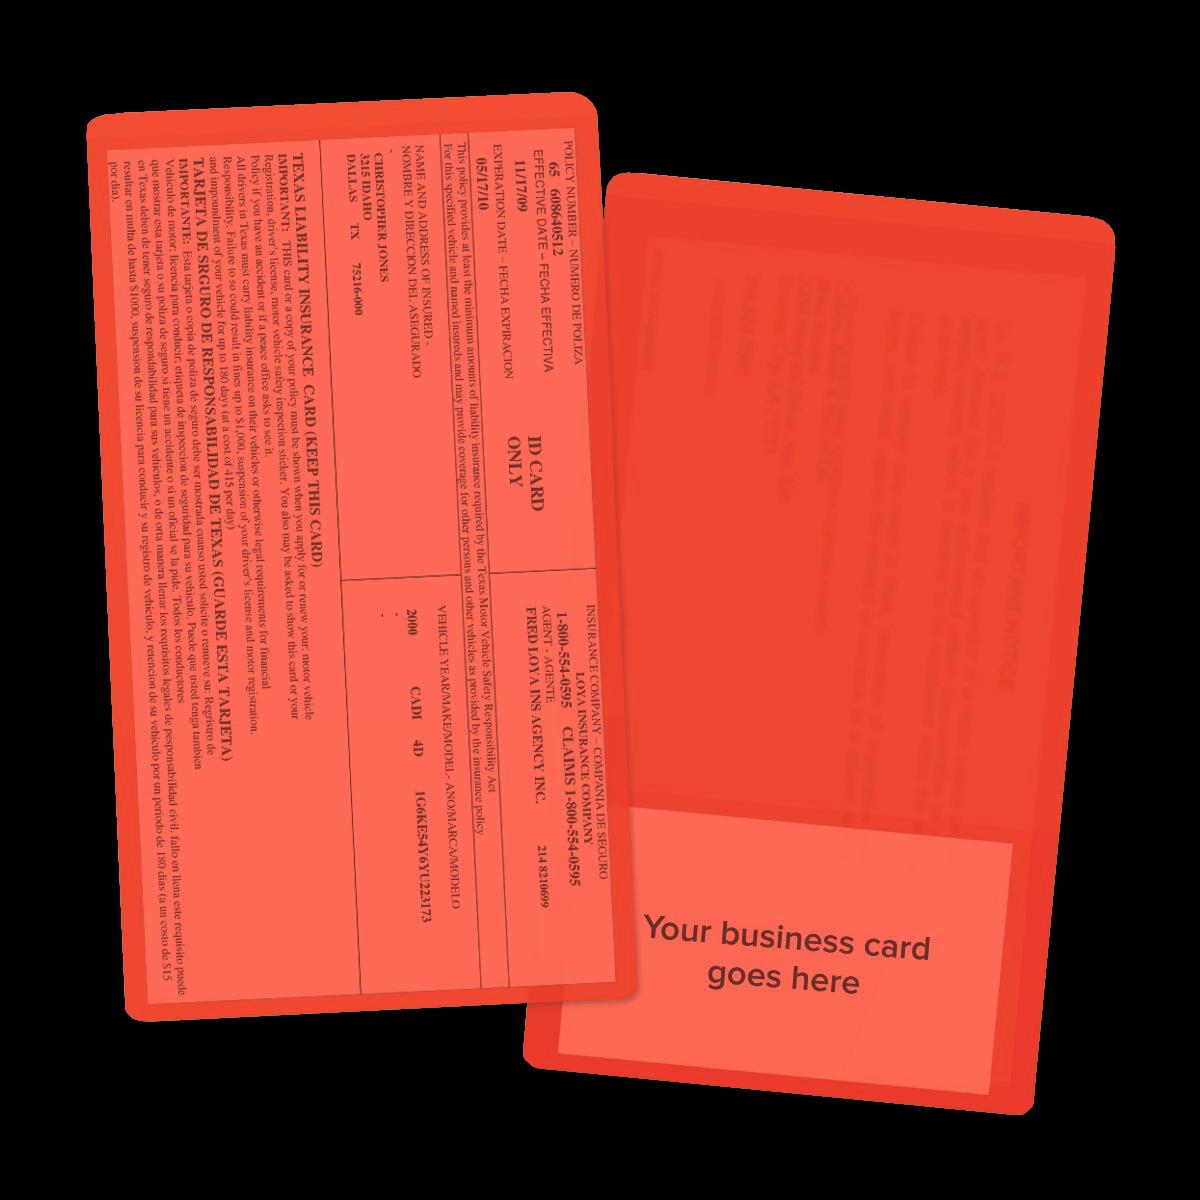 picture of orange insurance card holders - Insurance Card Holder